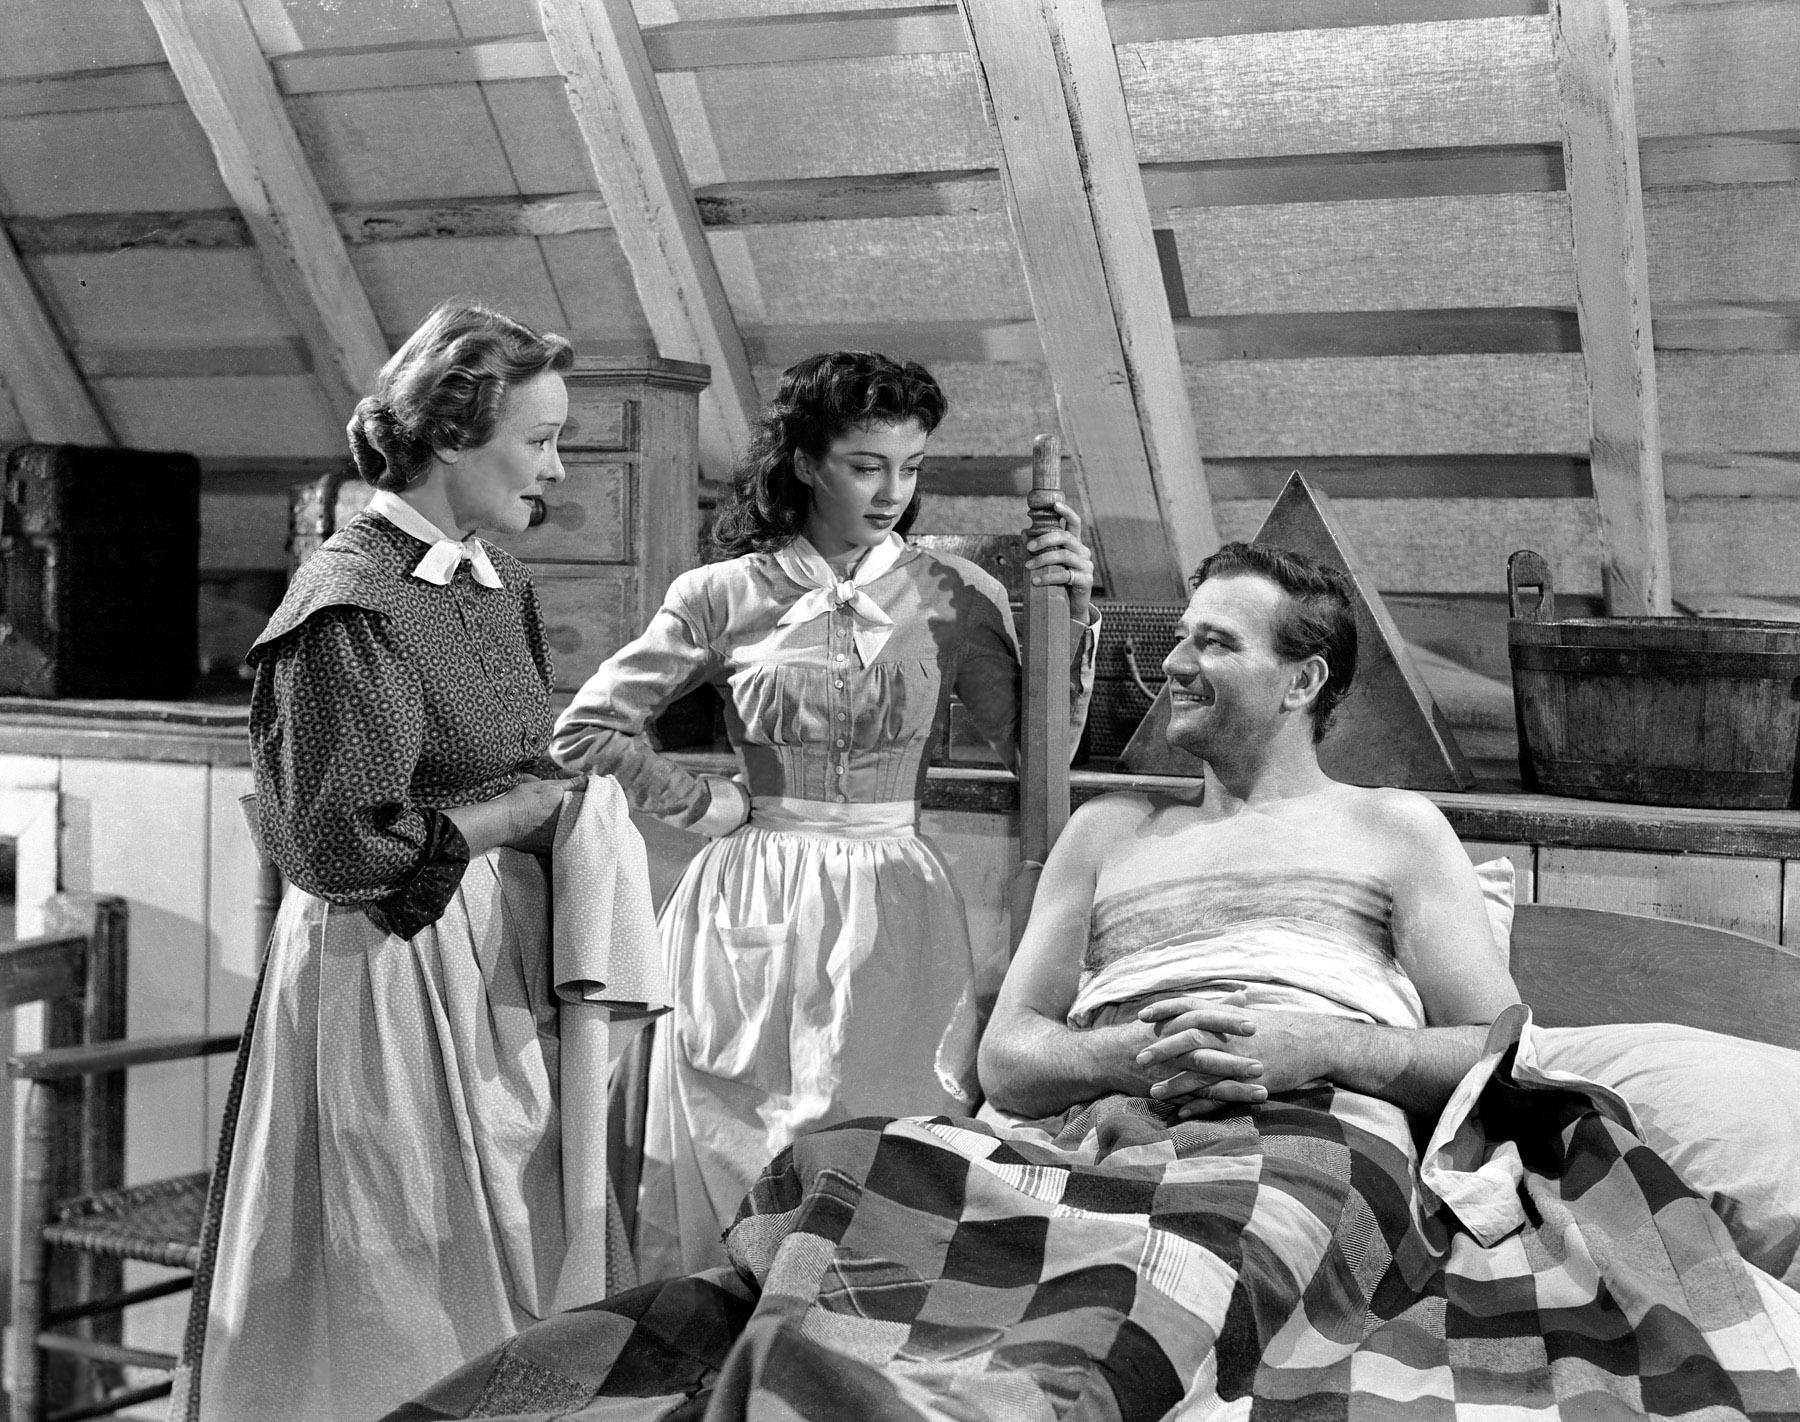 (L to R) Irene Rich, Gail Russell, John Wayne